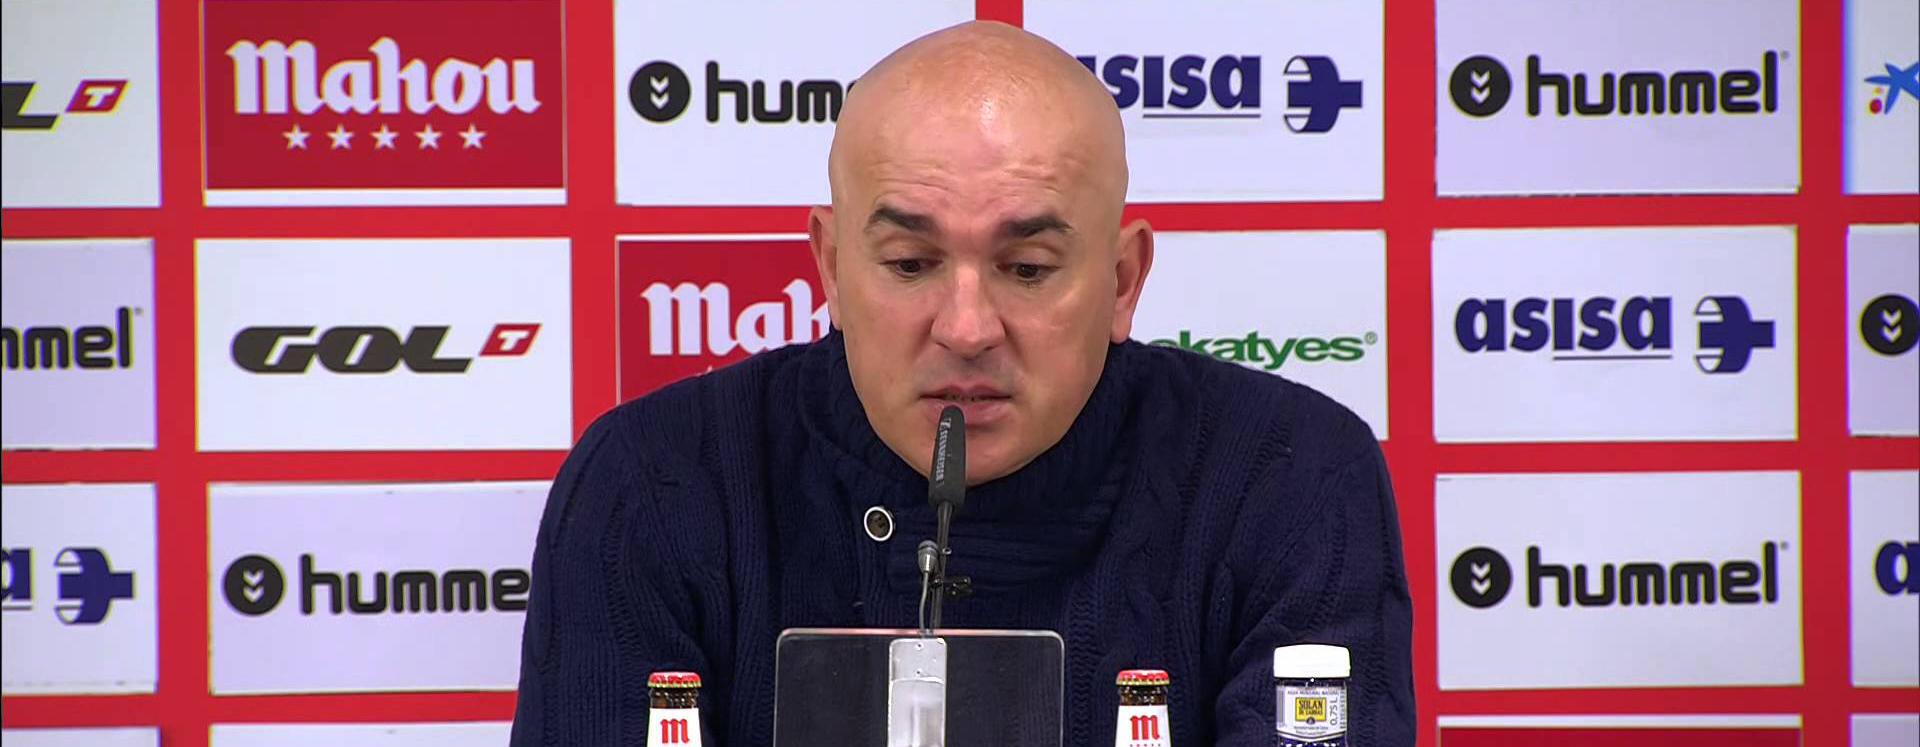 Luis César Sampedro durante aquella rueda de prensa tras empatar (2-2) ante el Real Oviedo <em><strong>(Imagen Vía YouTube)</strong></em>